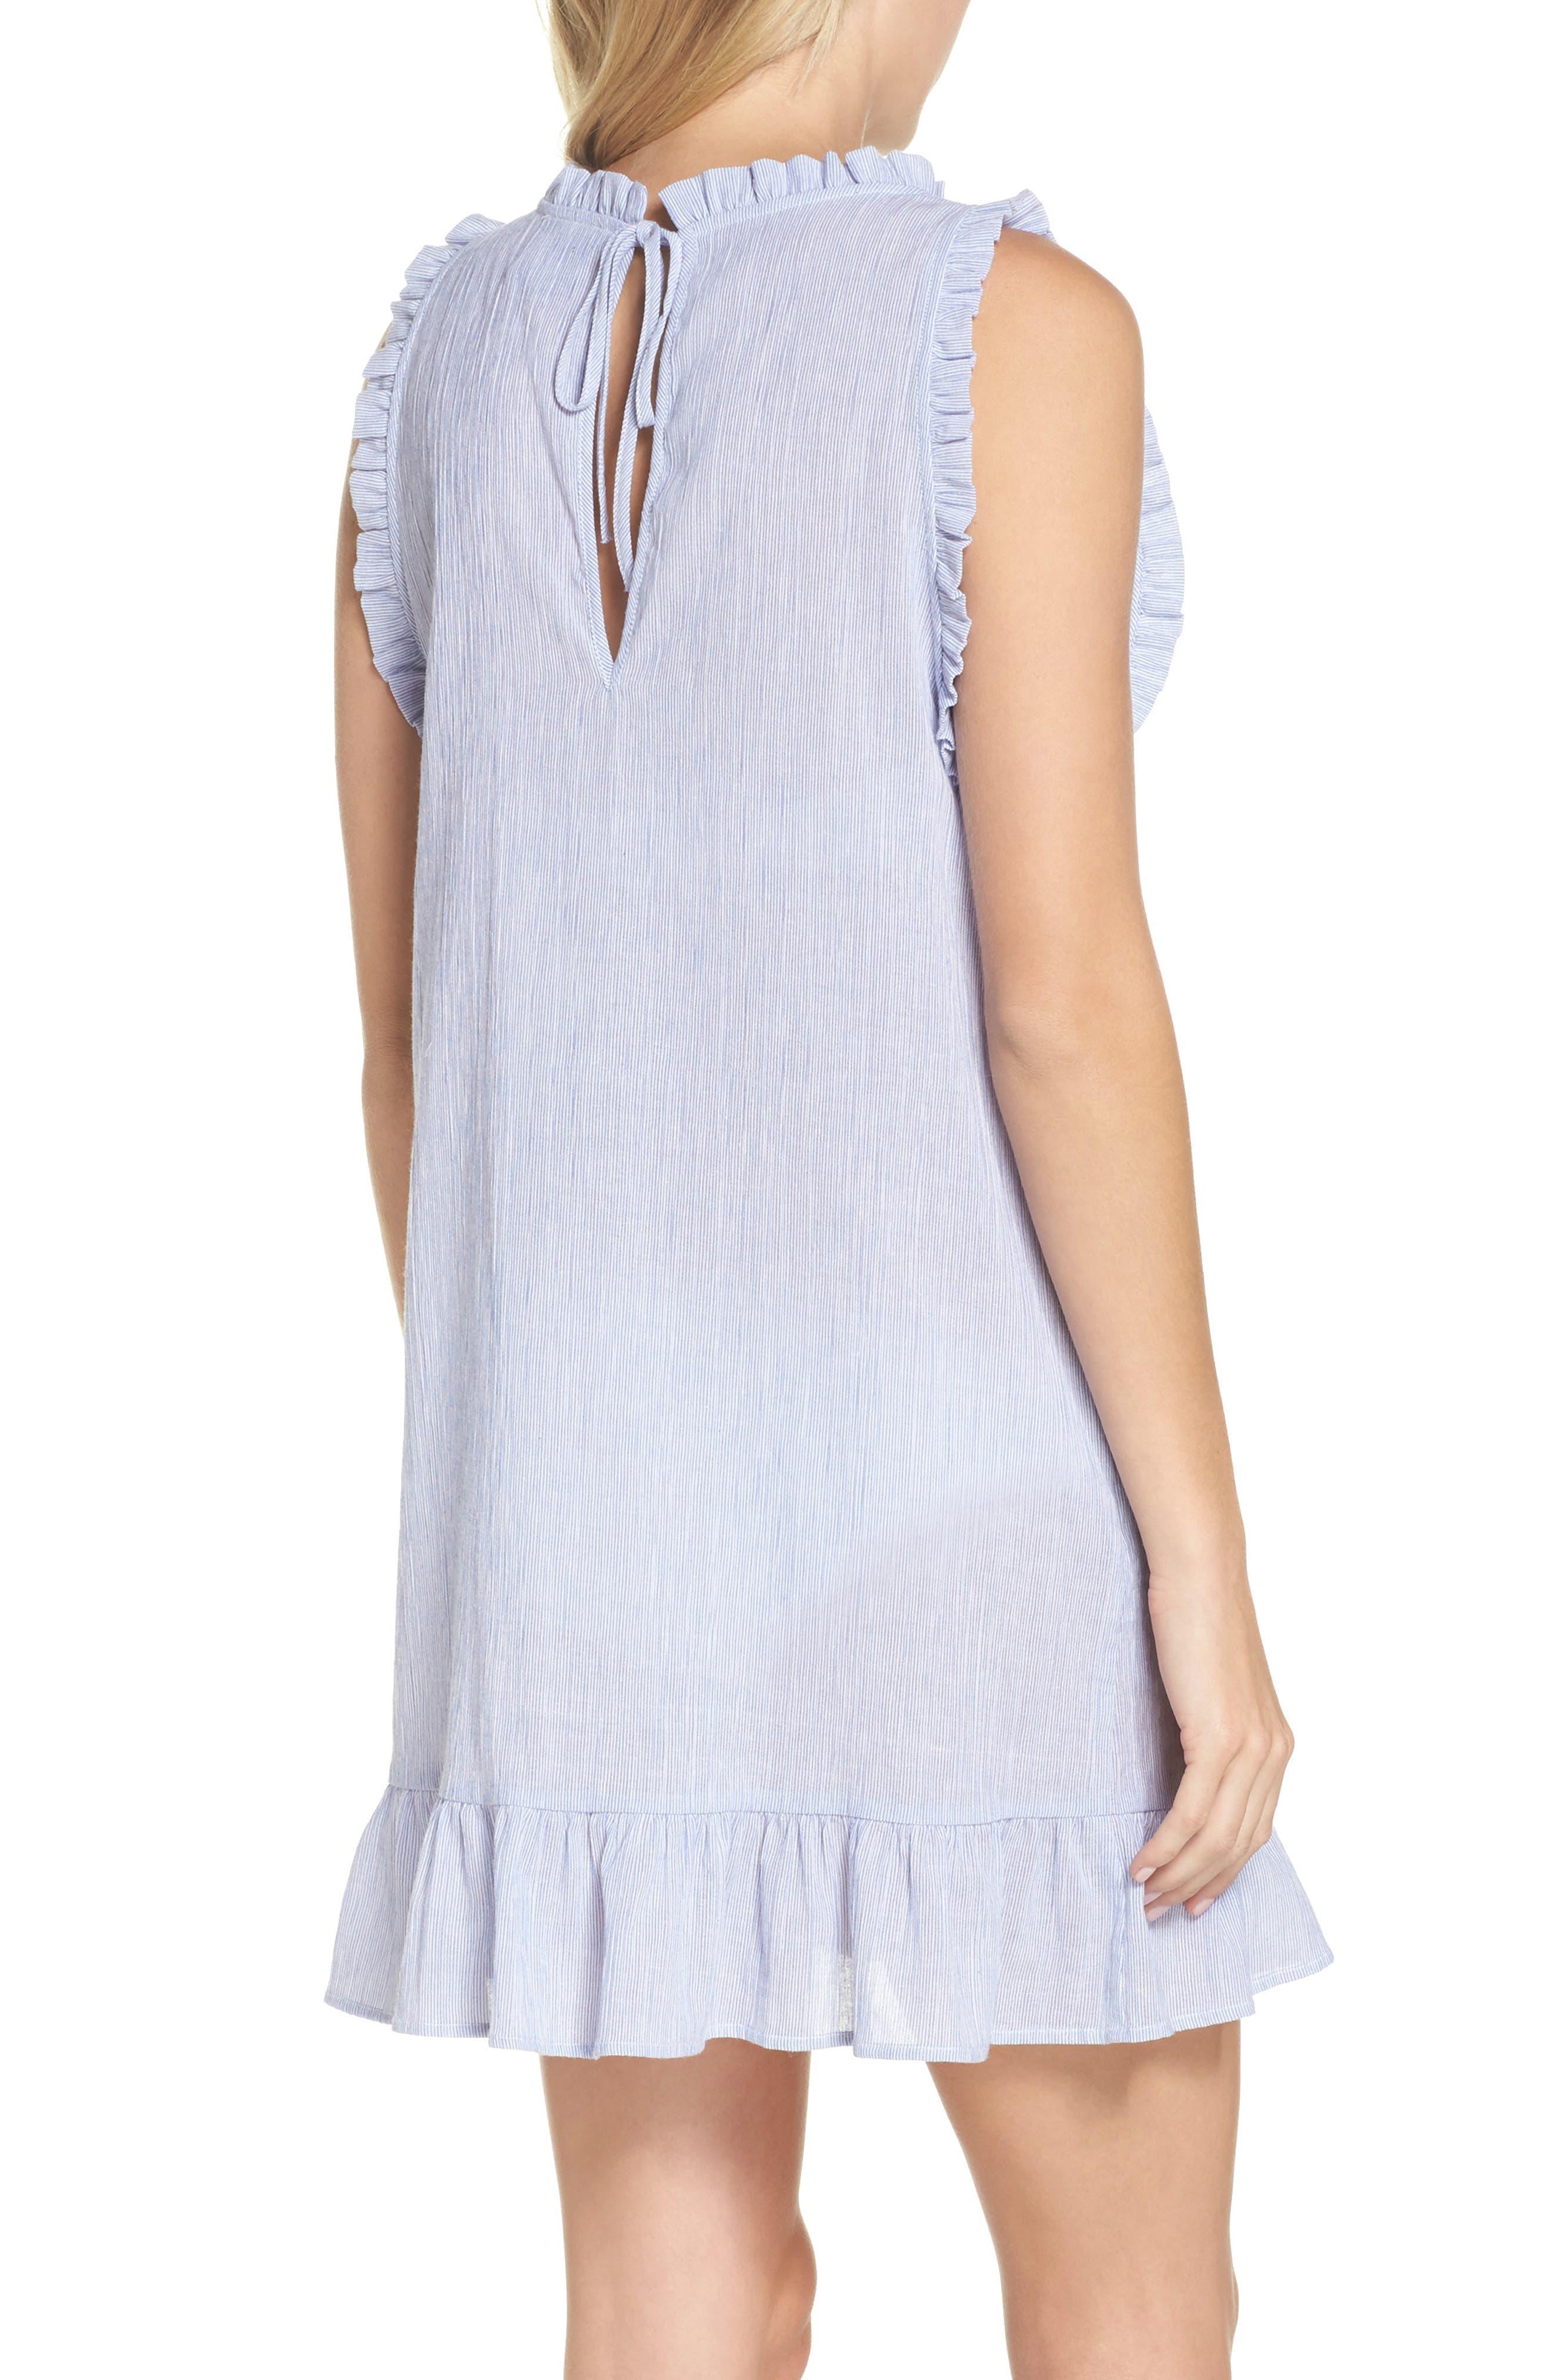 Heidi Cover-Up Dress,                             Alternate thumbnail 2, color,                             401